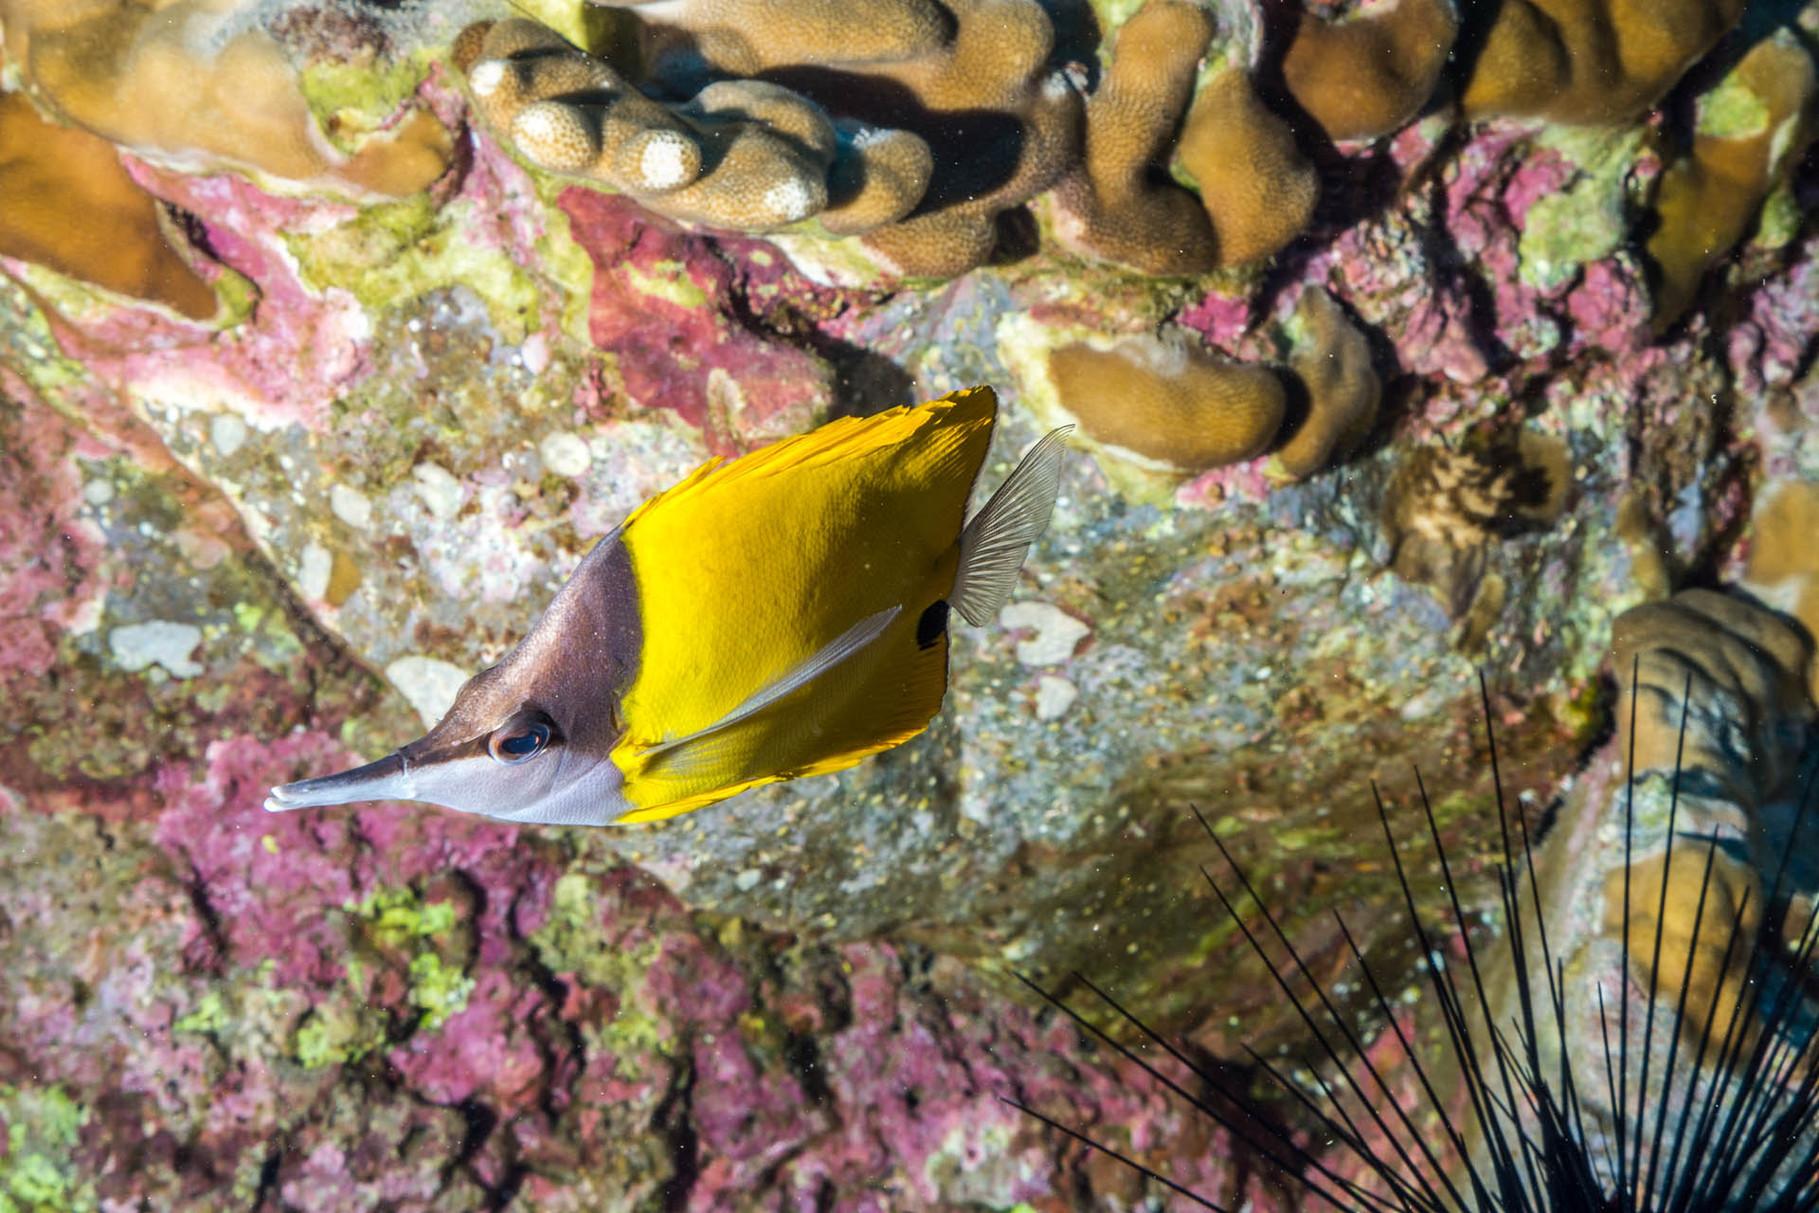 Yellow longnose butterflyfish (Forcipiger flavissimus)